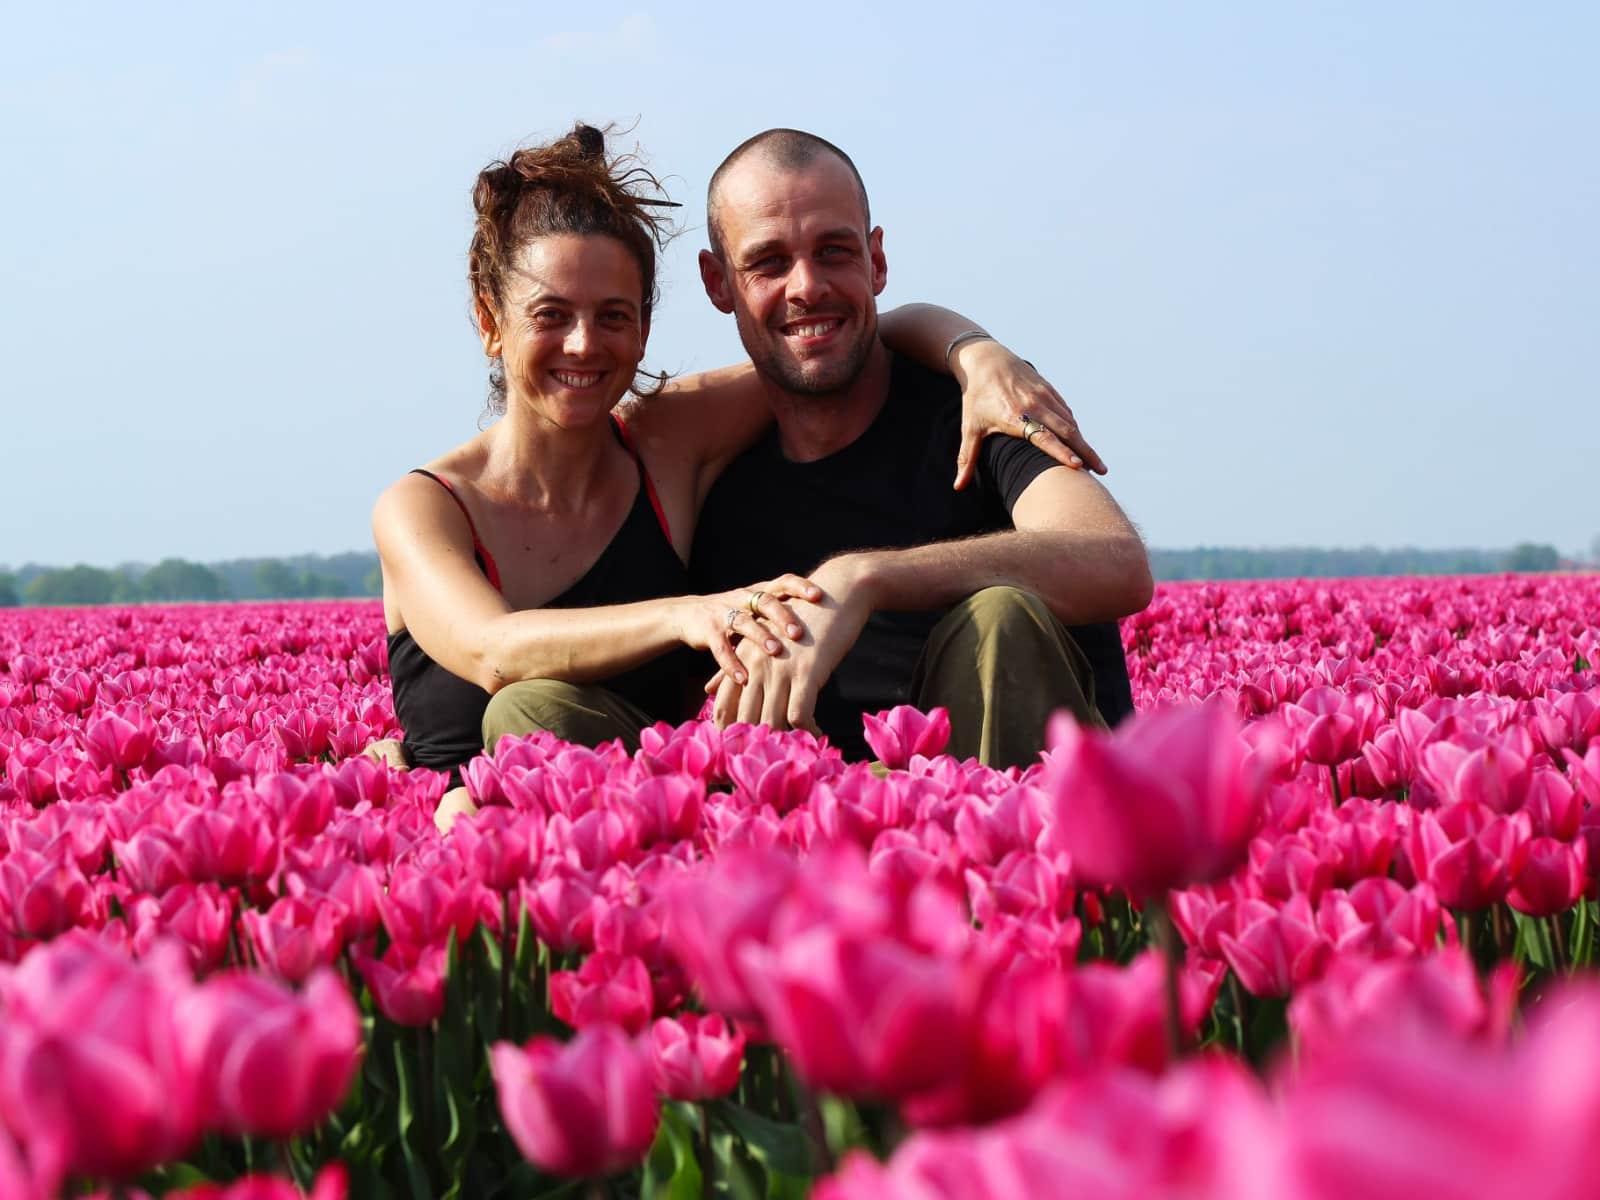 Jeroen & mirjam & Mirjam from Landivy, France